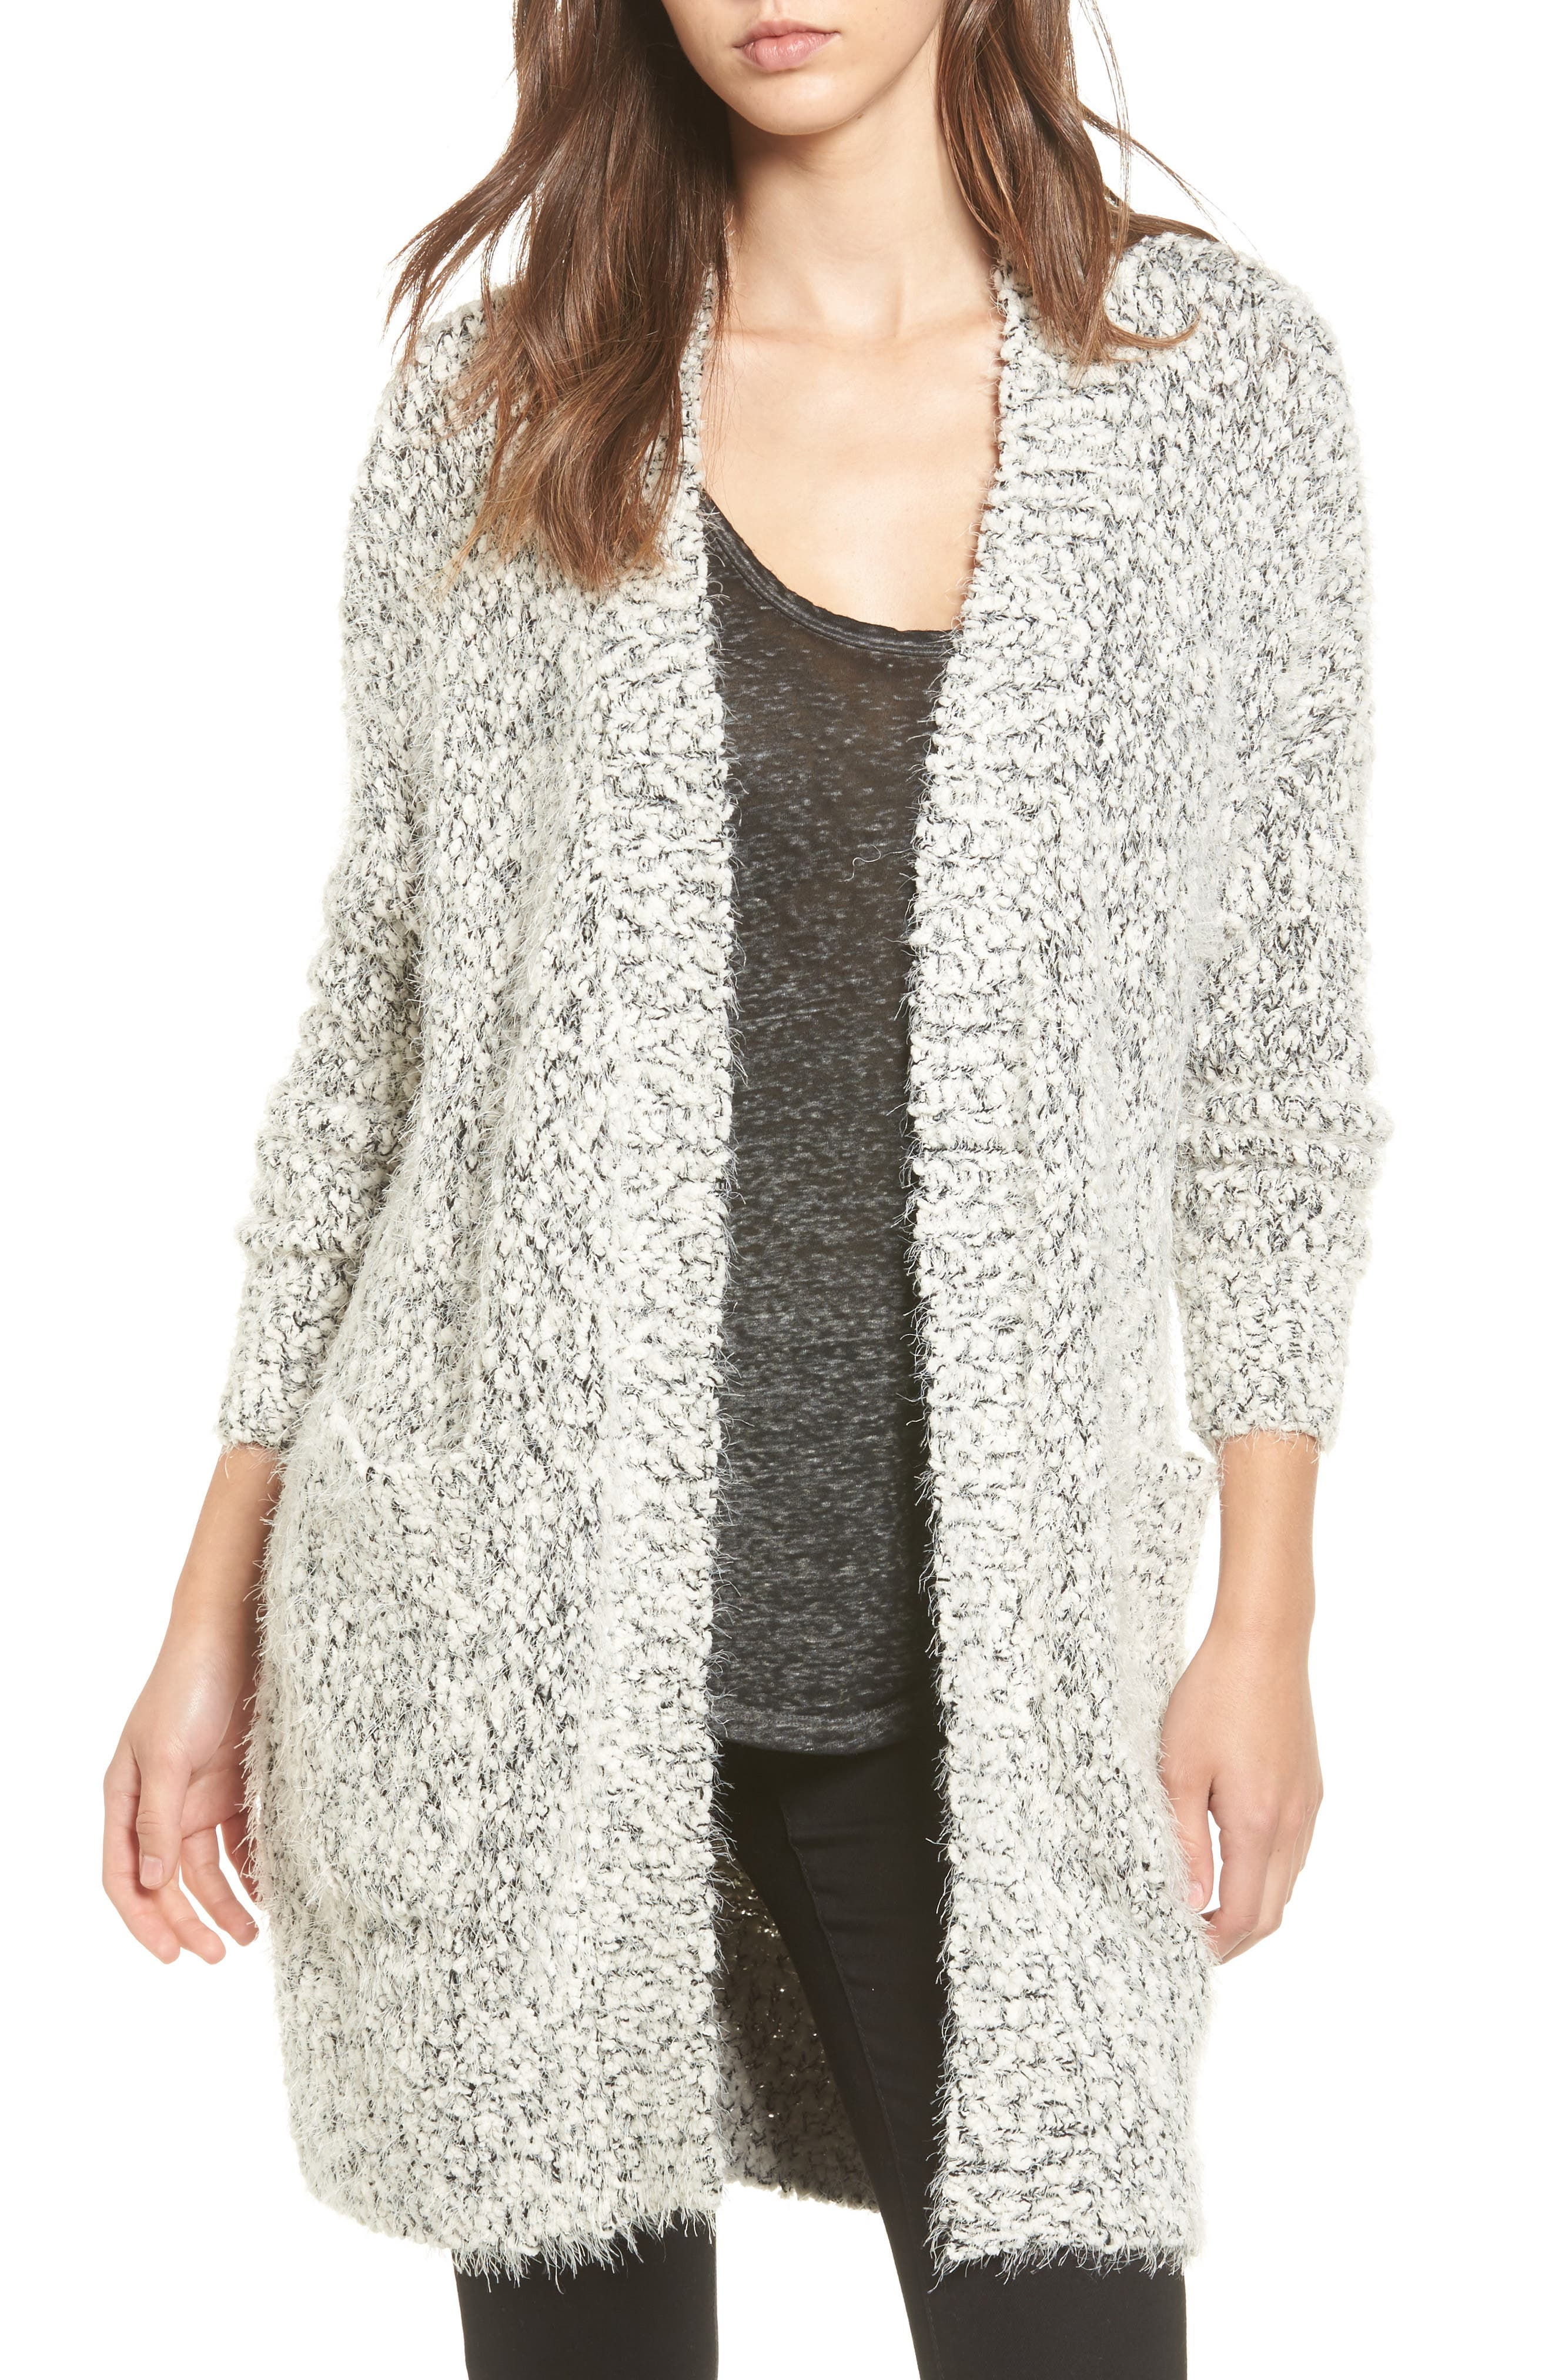 Alternate Image 1 Selected - Lira Clothing Miranda Knit Cardigan